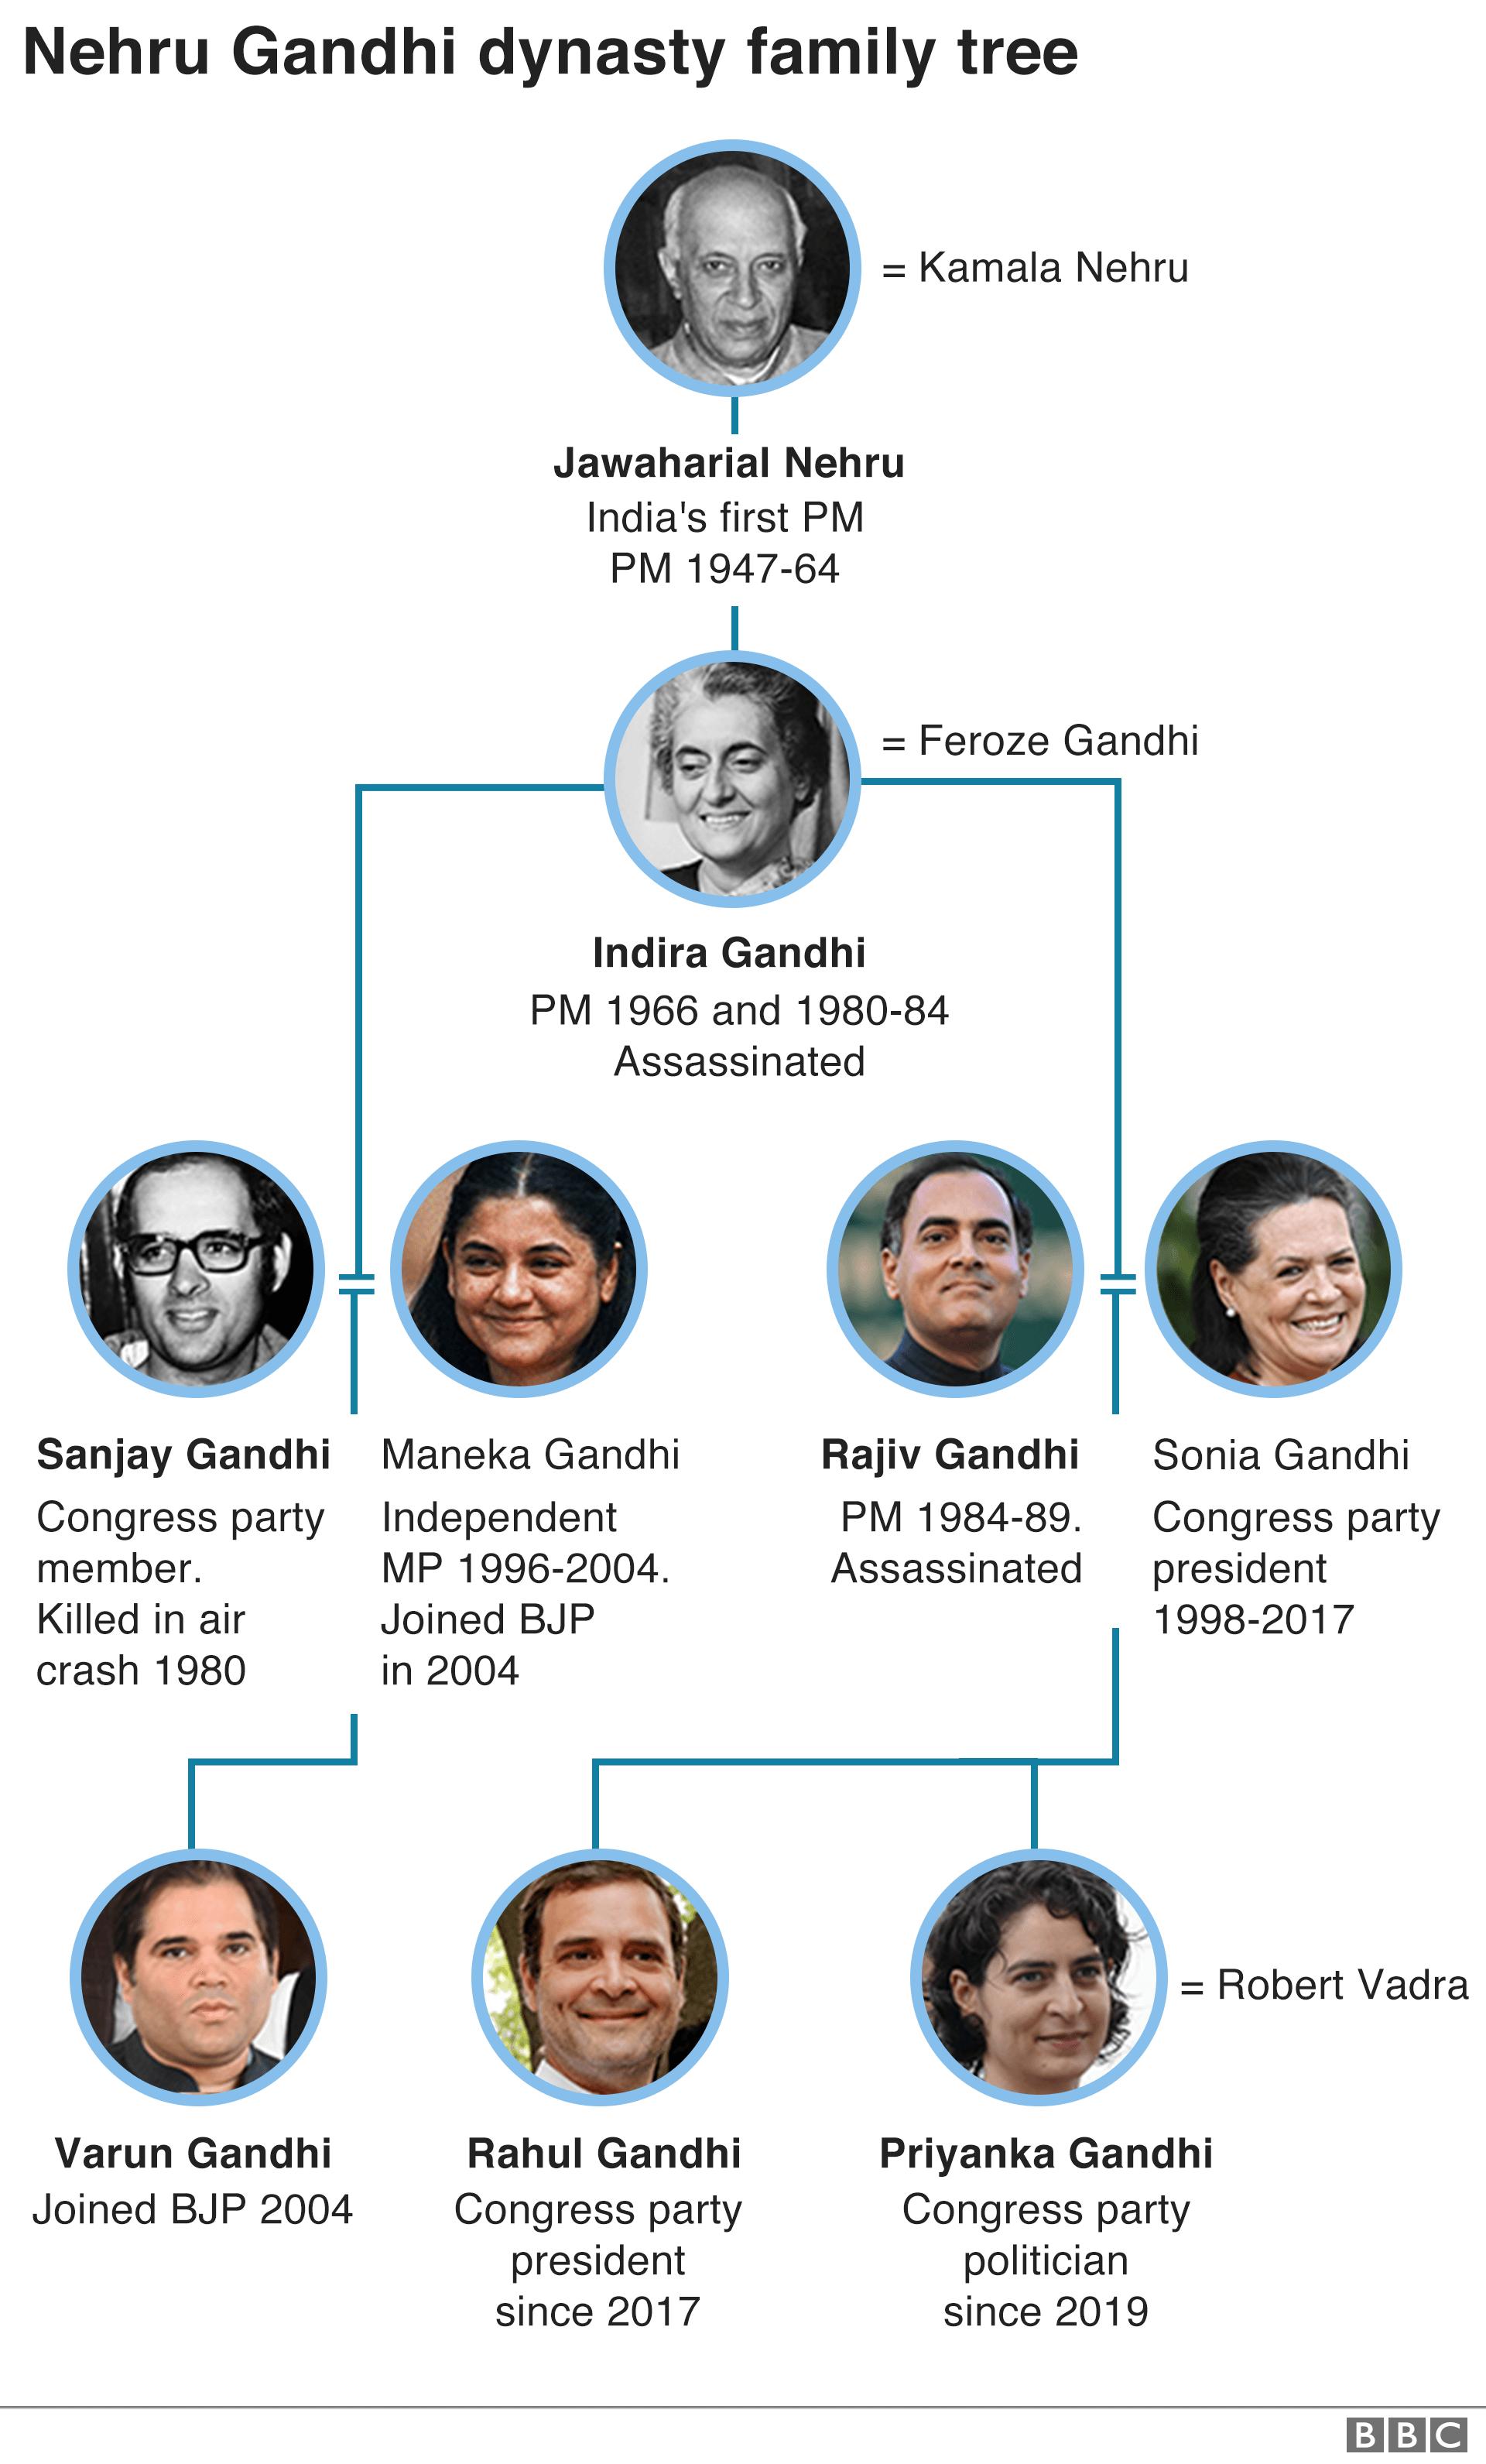 Gandhi family tree